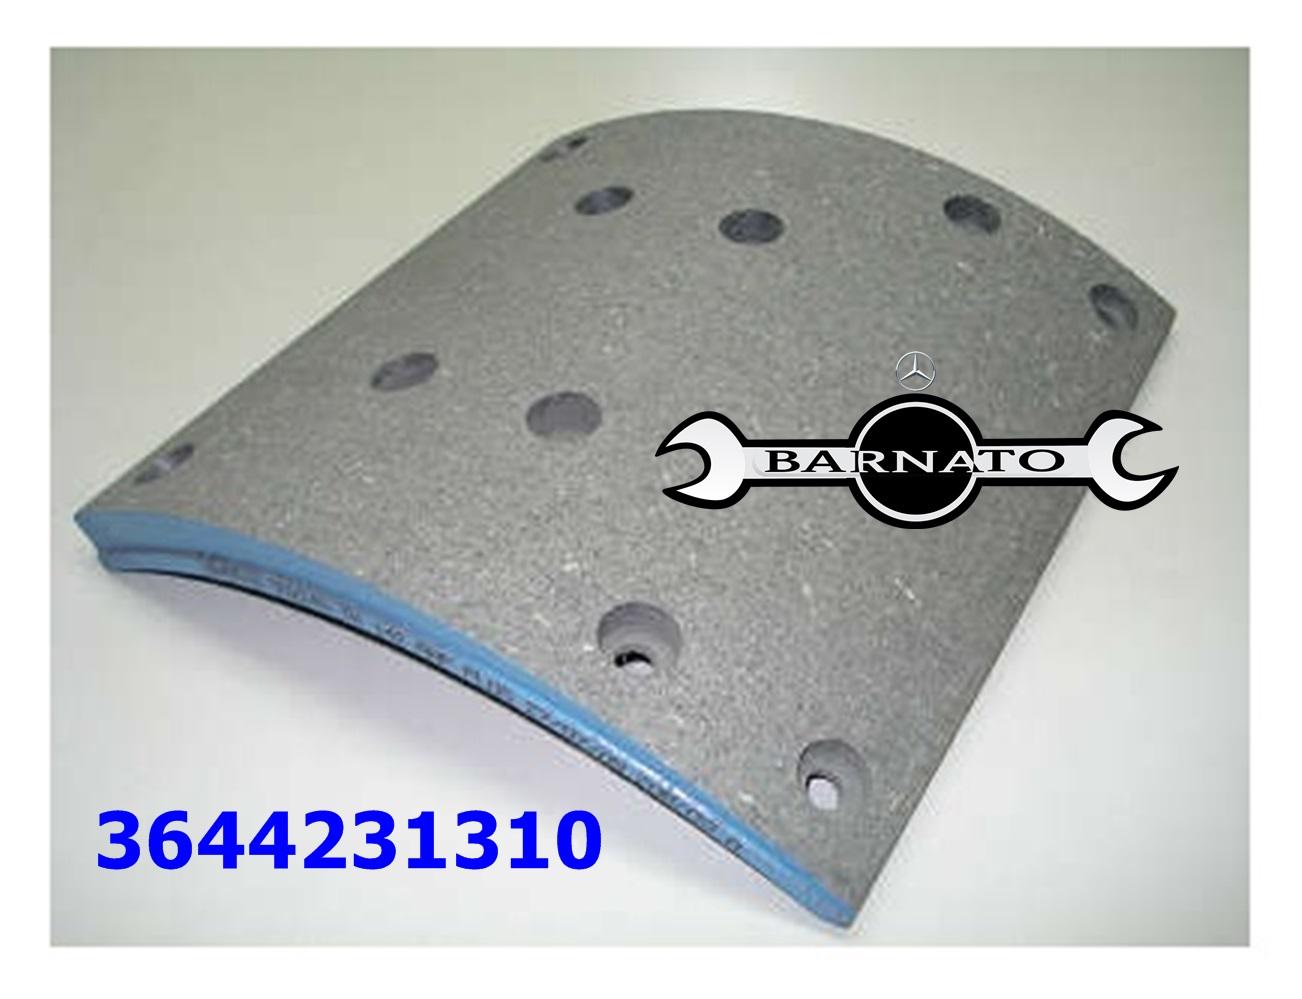 http://www.barnatoloja.com.br/produto.php?cod_produto=6428443